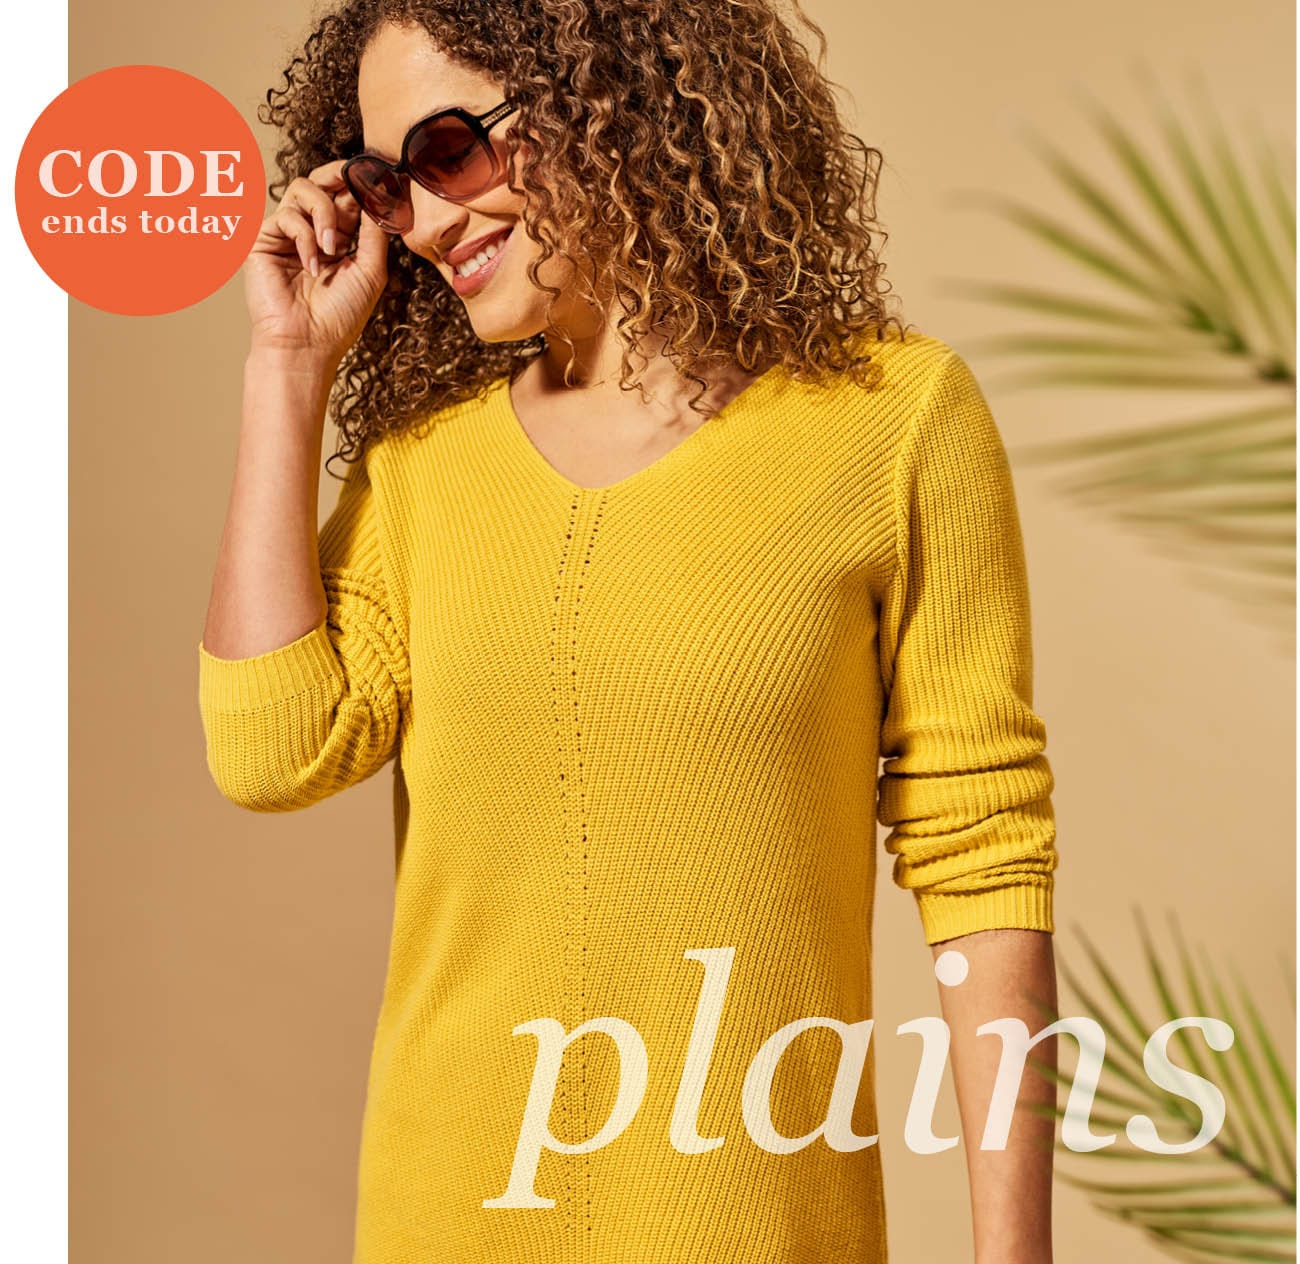 Womens Cotton Pointelle Detail Jumper in Dandelion Yellow